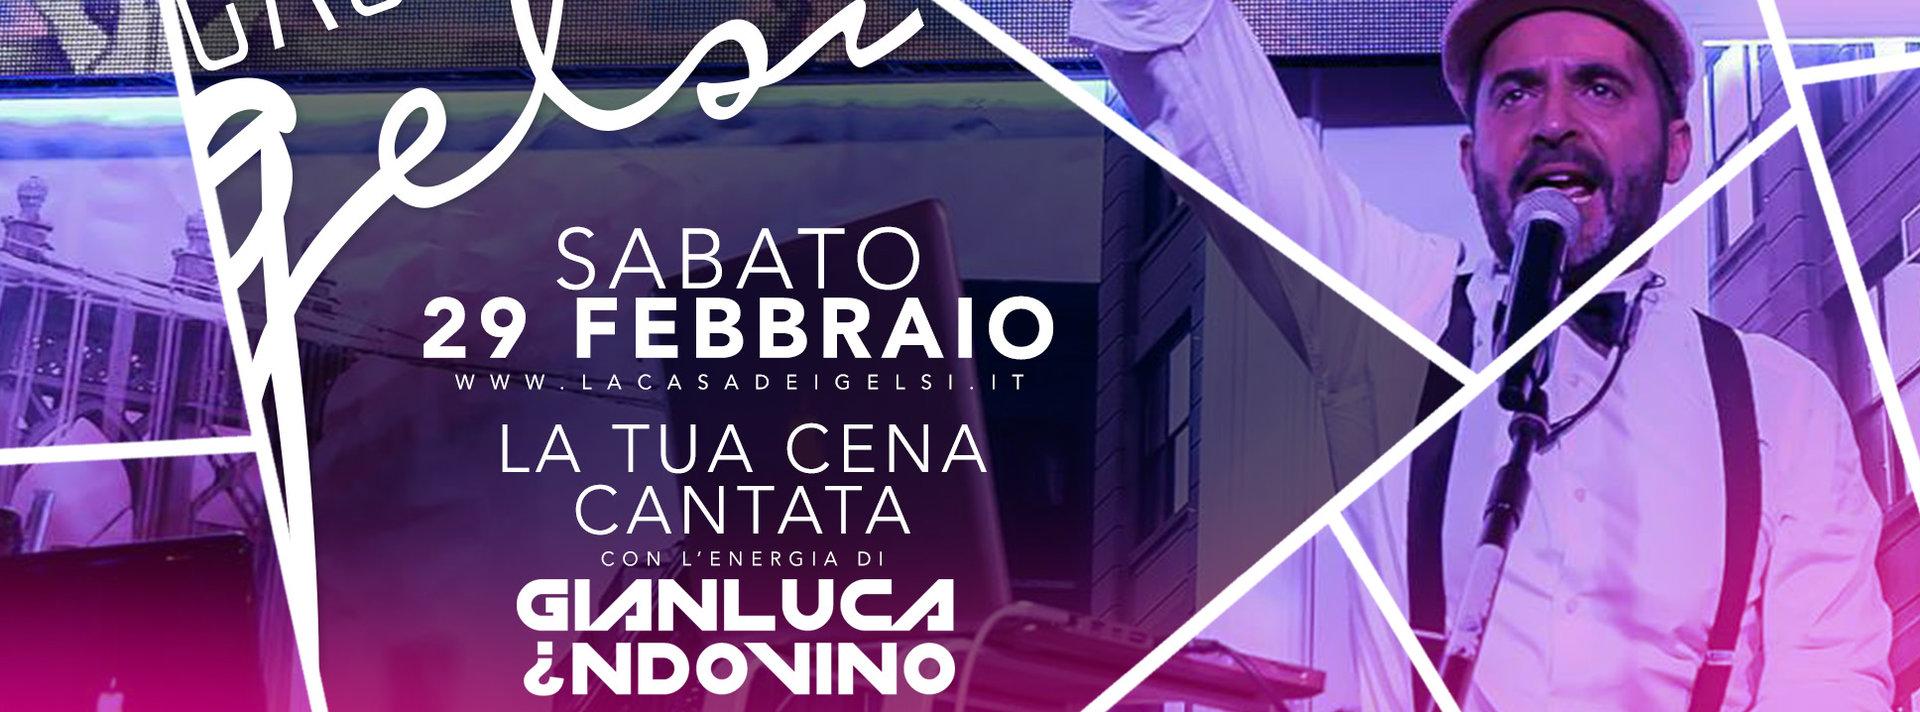 Sabato sera Gelsi con Gianluca Indovino - 29 febbr